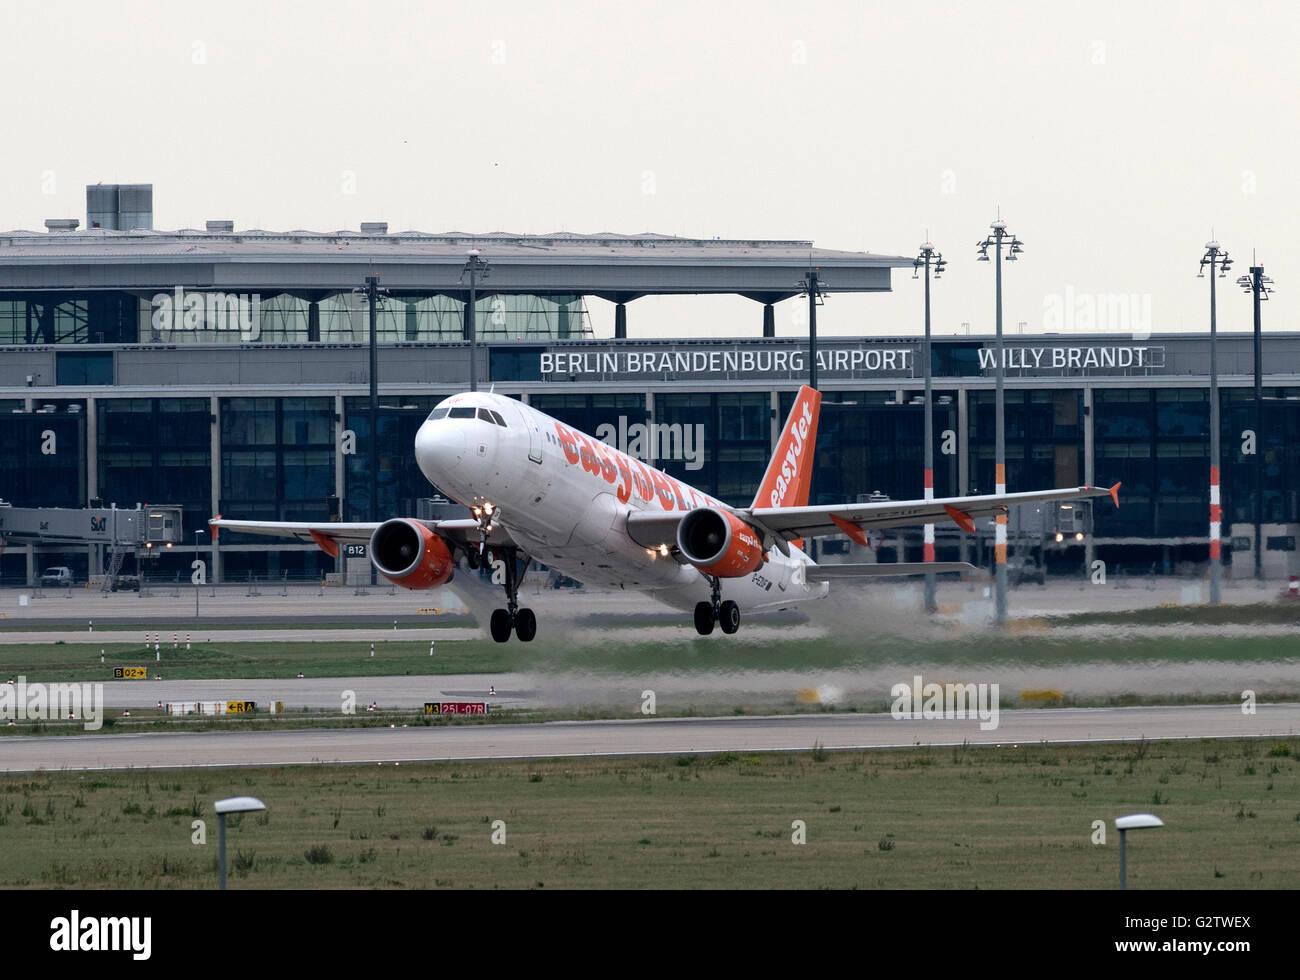 17.09.2015, Schoenefeld, Brandenburg, Germany - During the renovation of the northern runway of Schoenefeld airport, - Stock Image